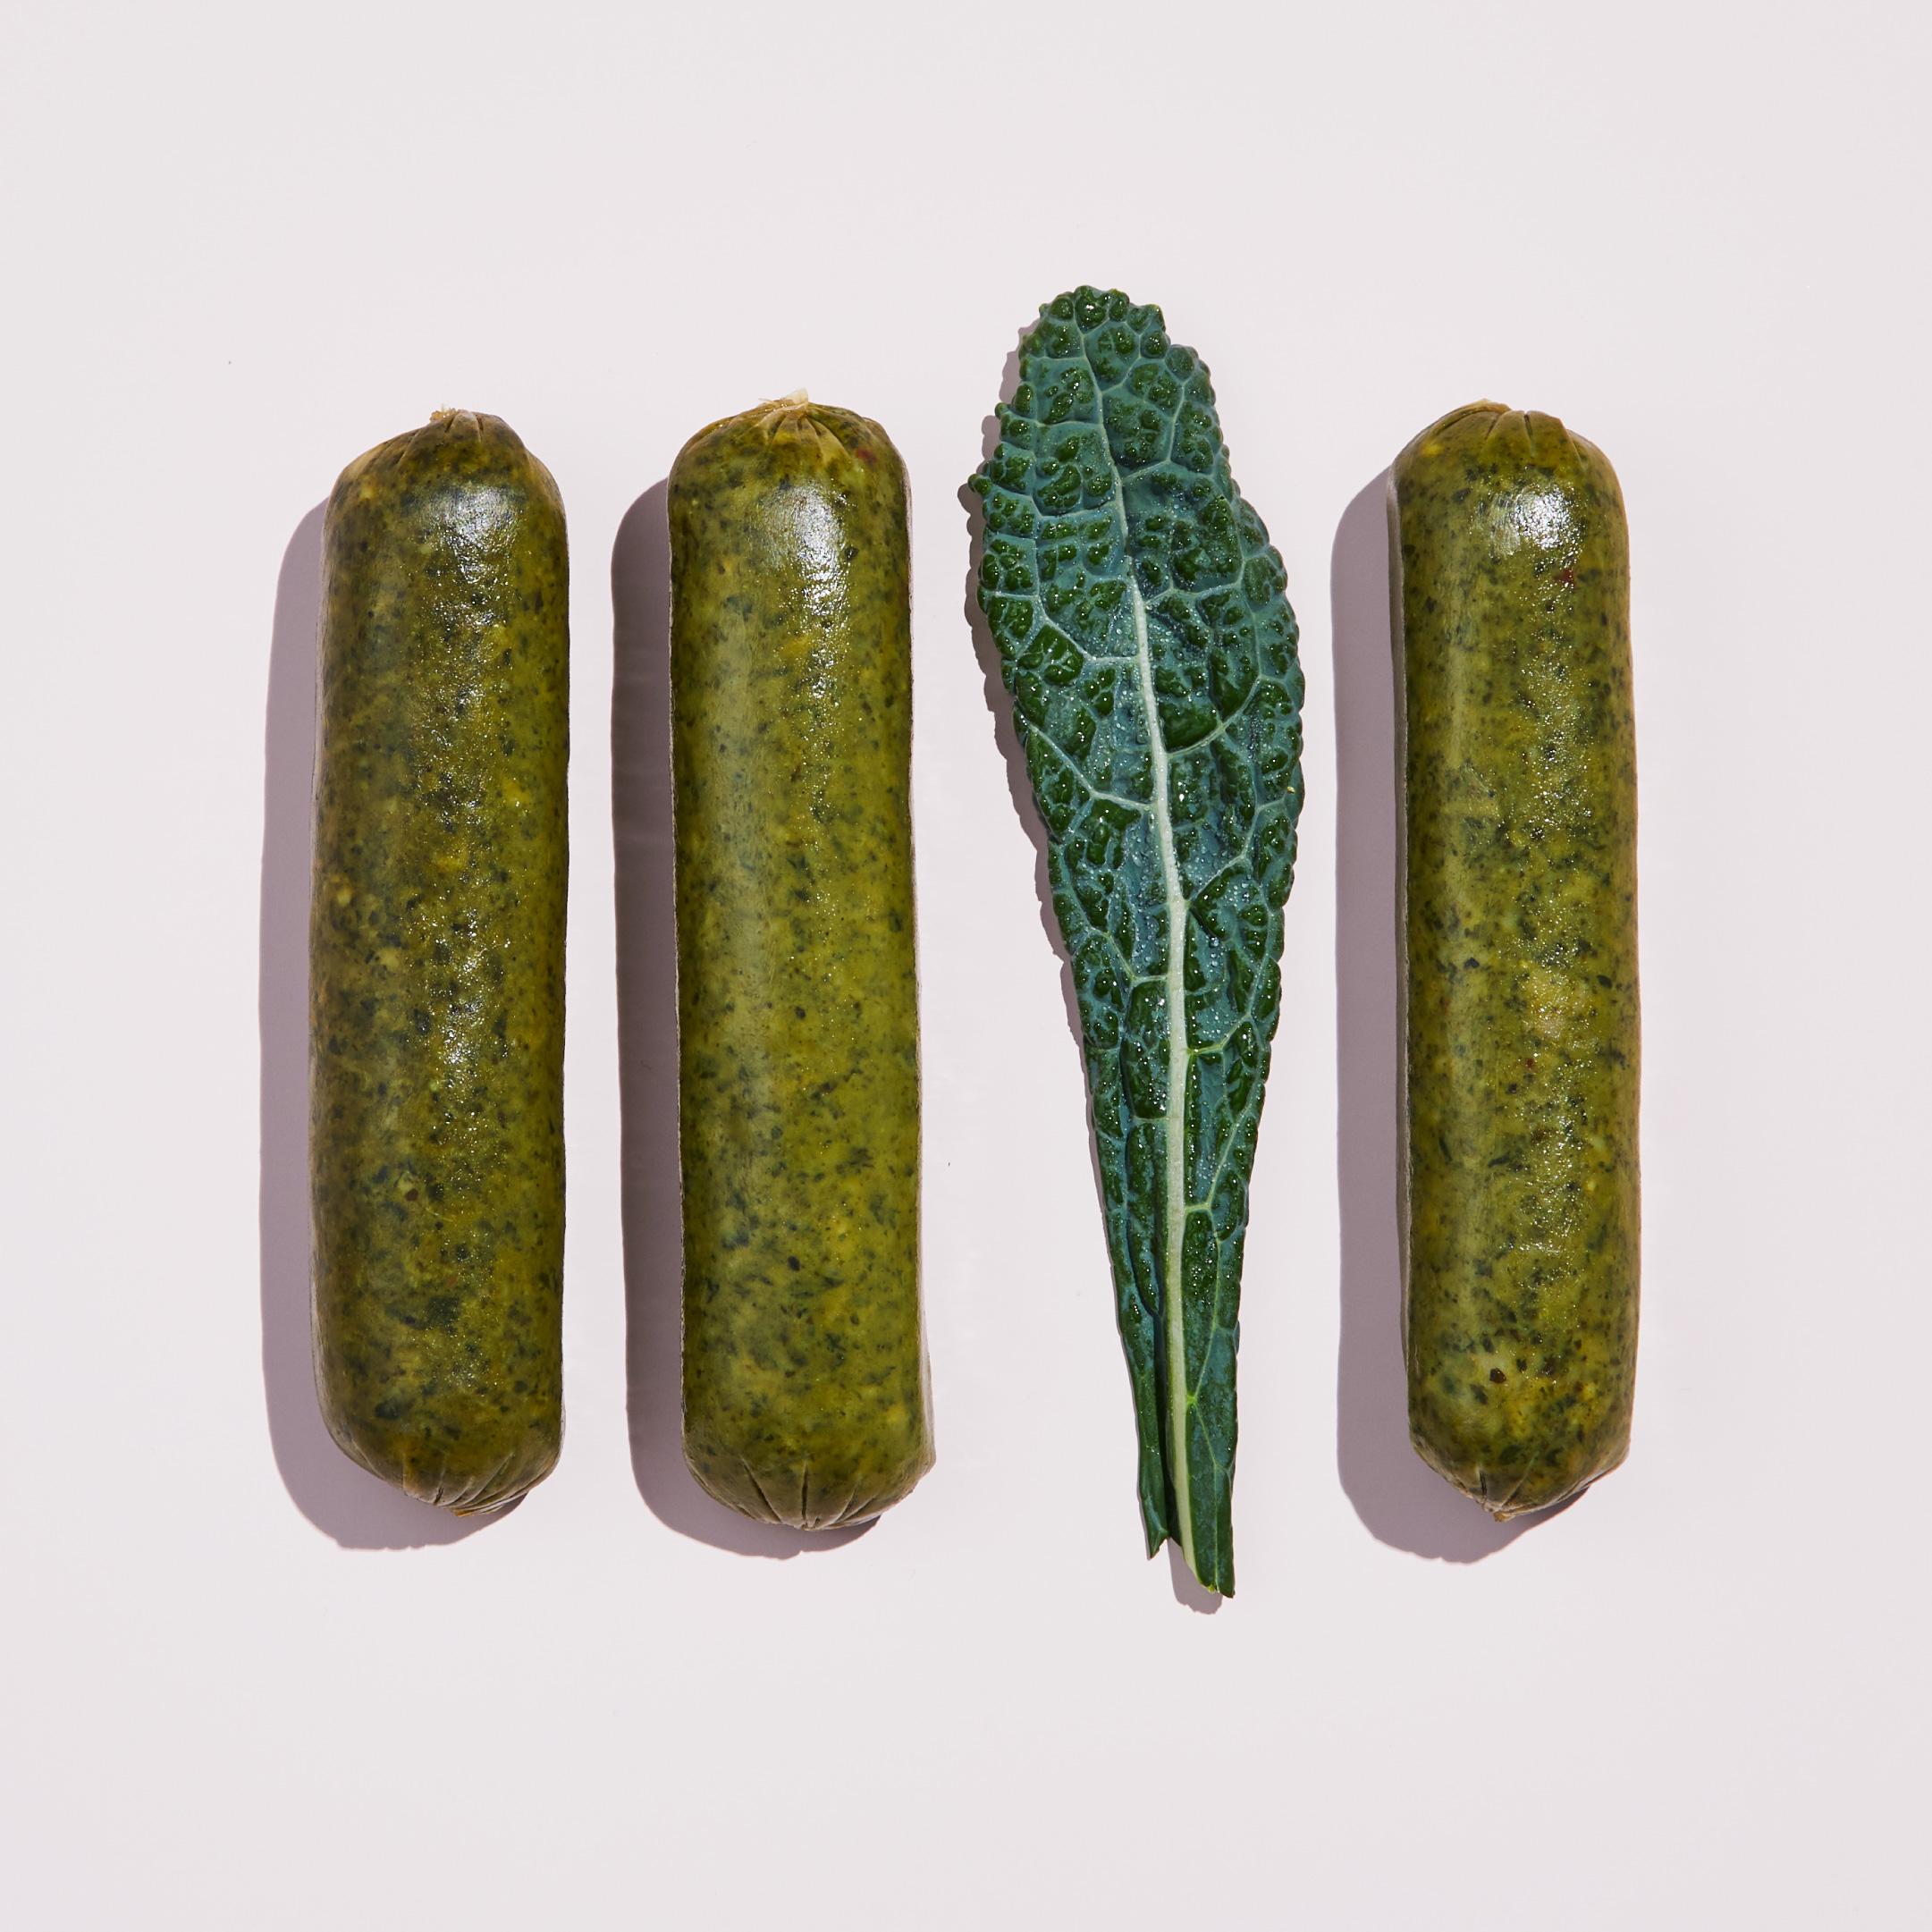 misfit-sausage-kale-row@2x.jpg